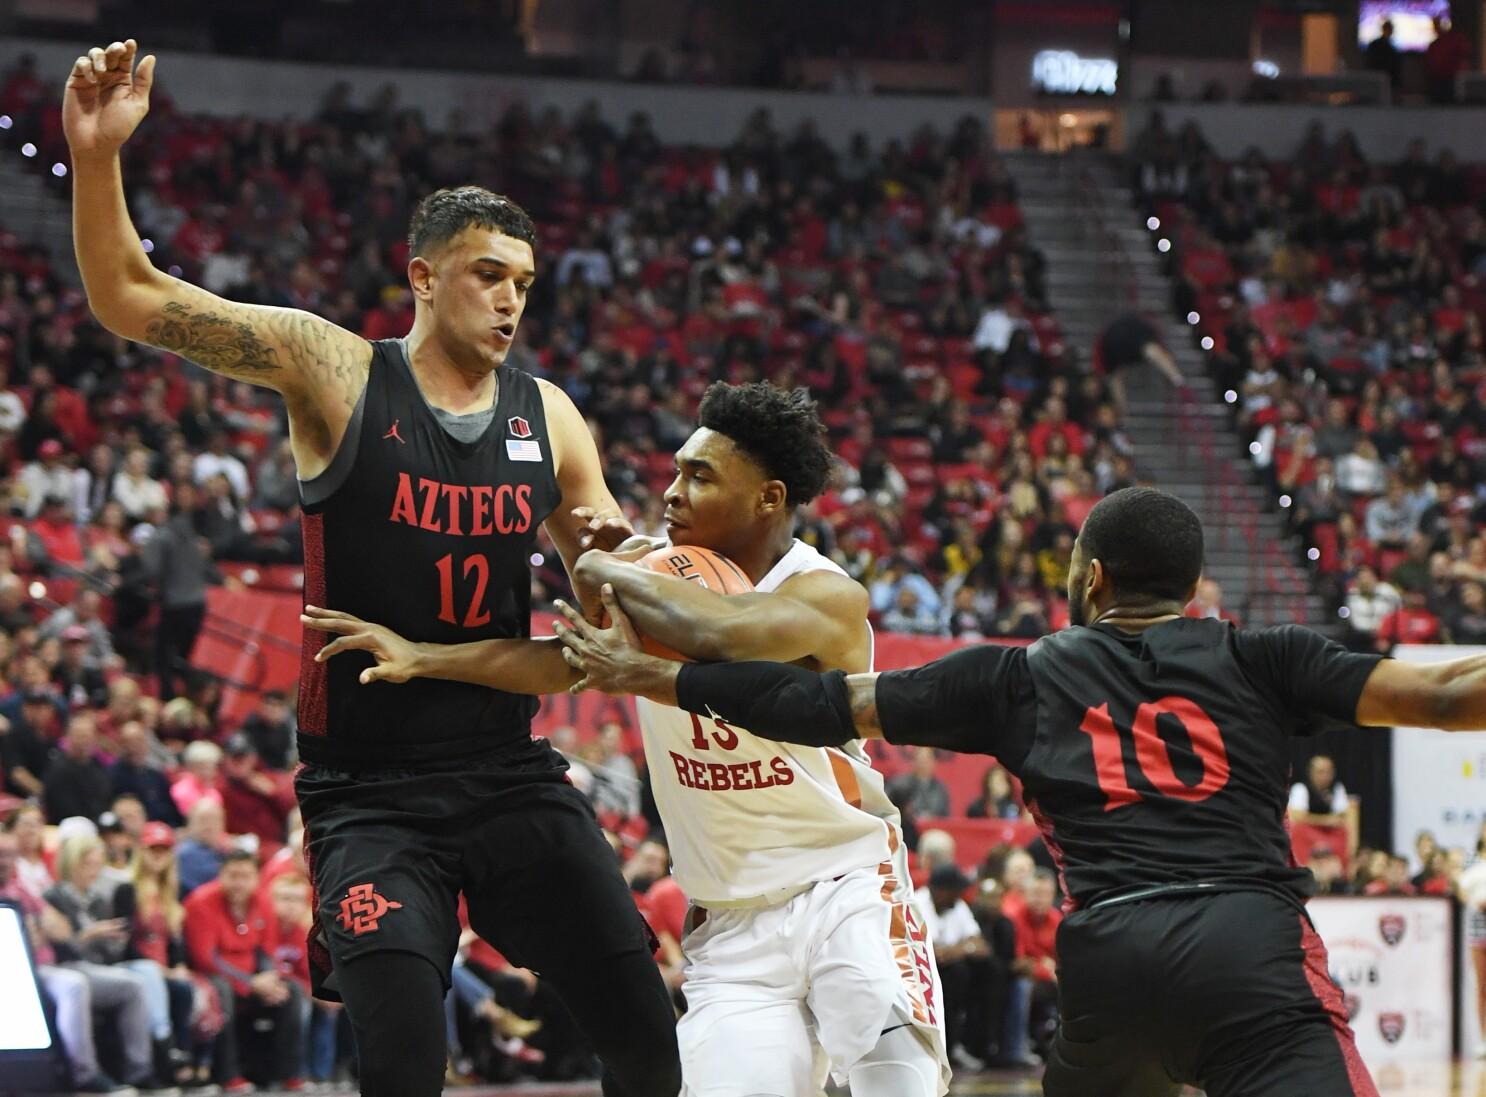 Aztecs hit 21 in Las Vegas, set school record with win over UNLV